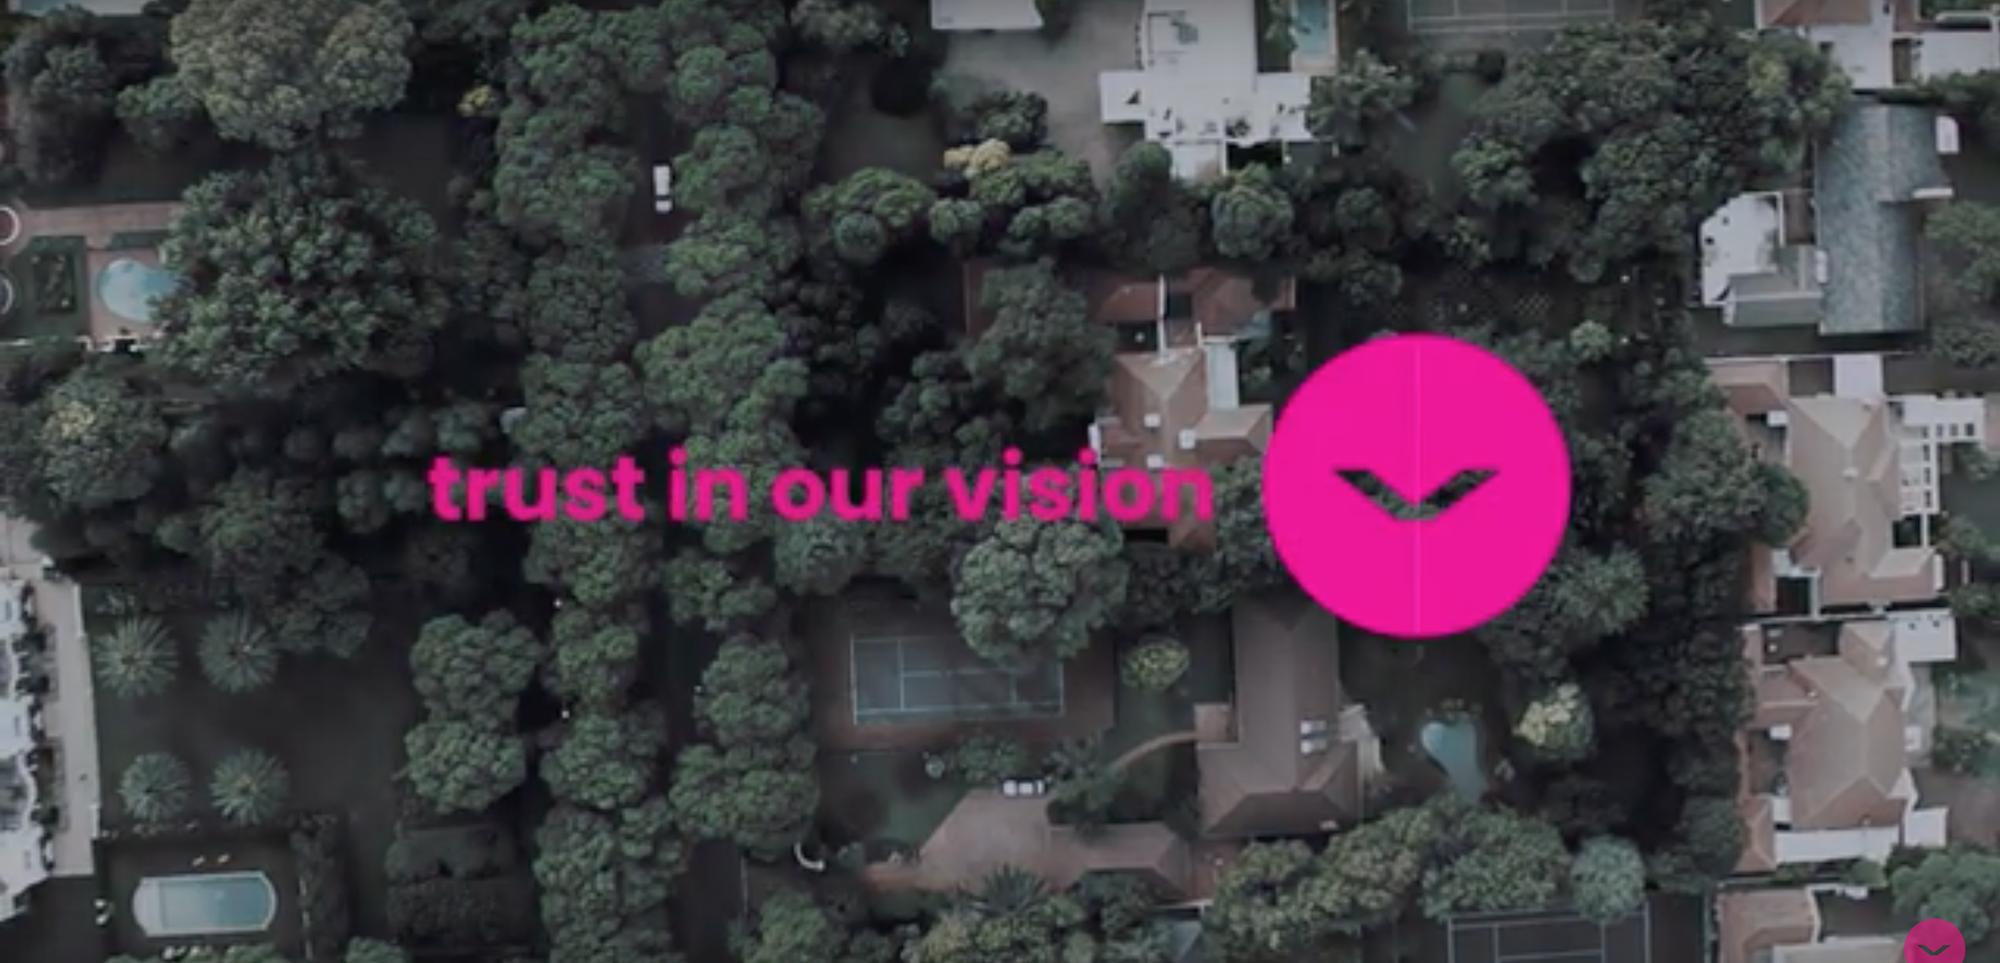 BUSINESS MAVERICK INVESTIGATION: Visual surveillance and